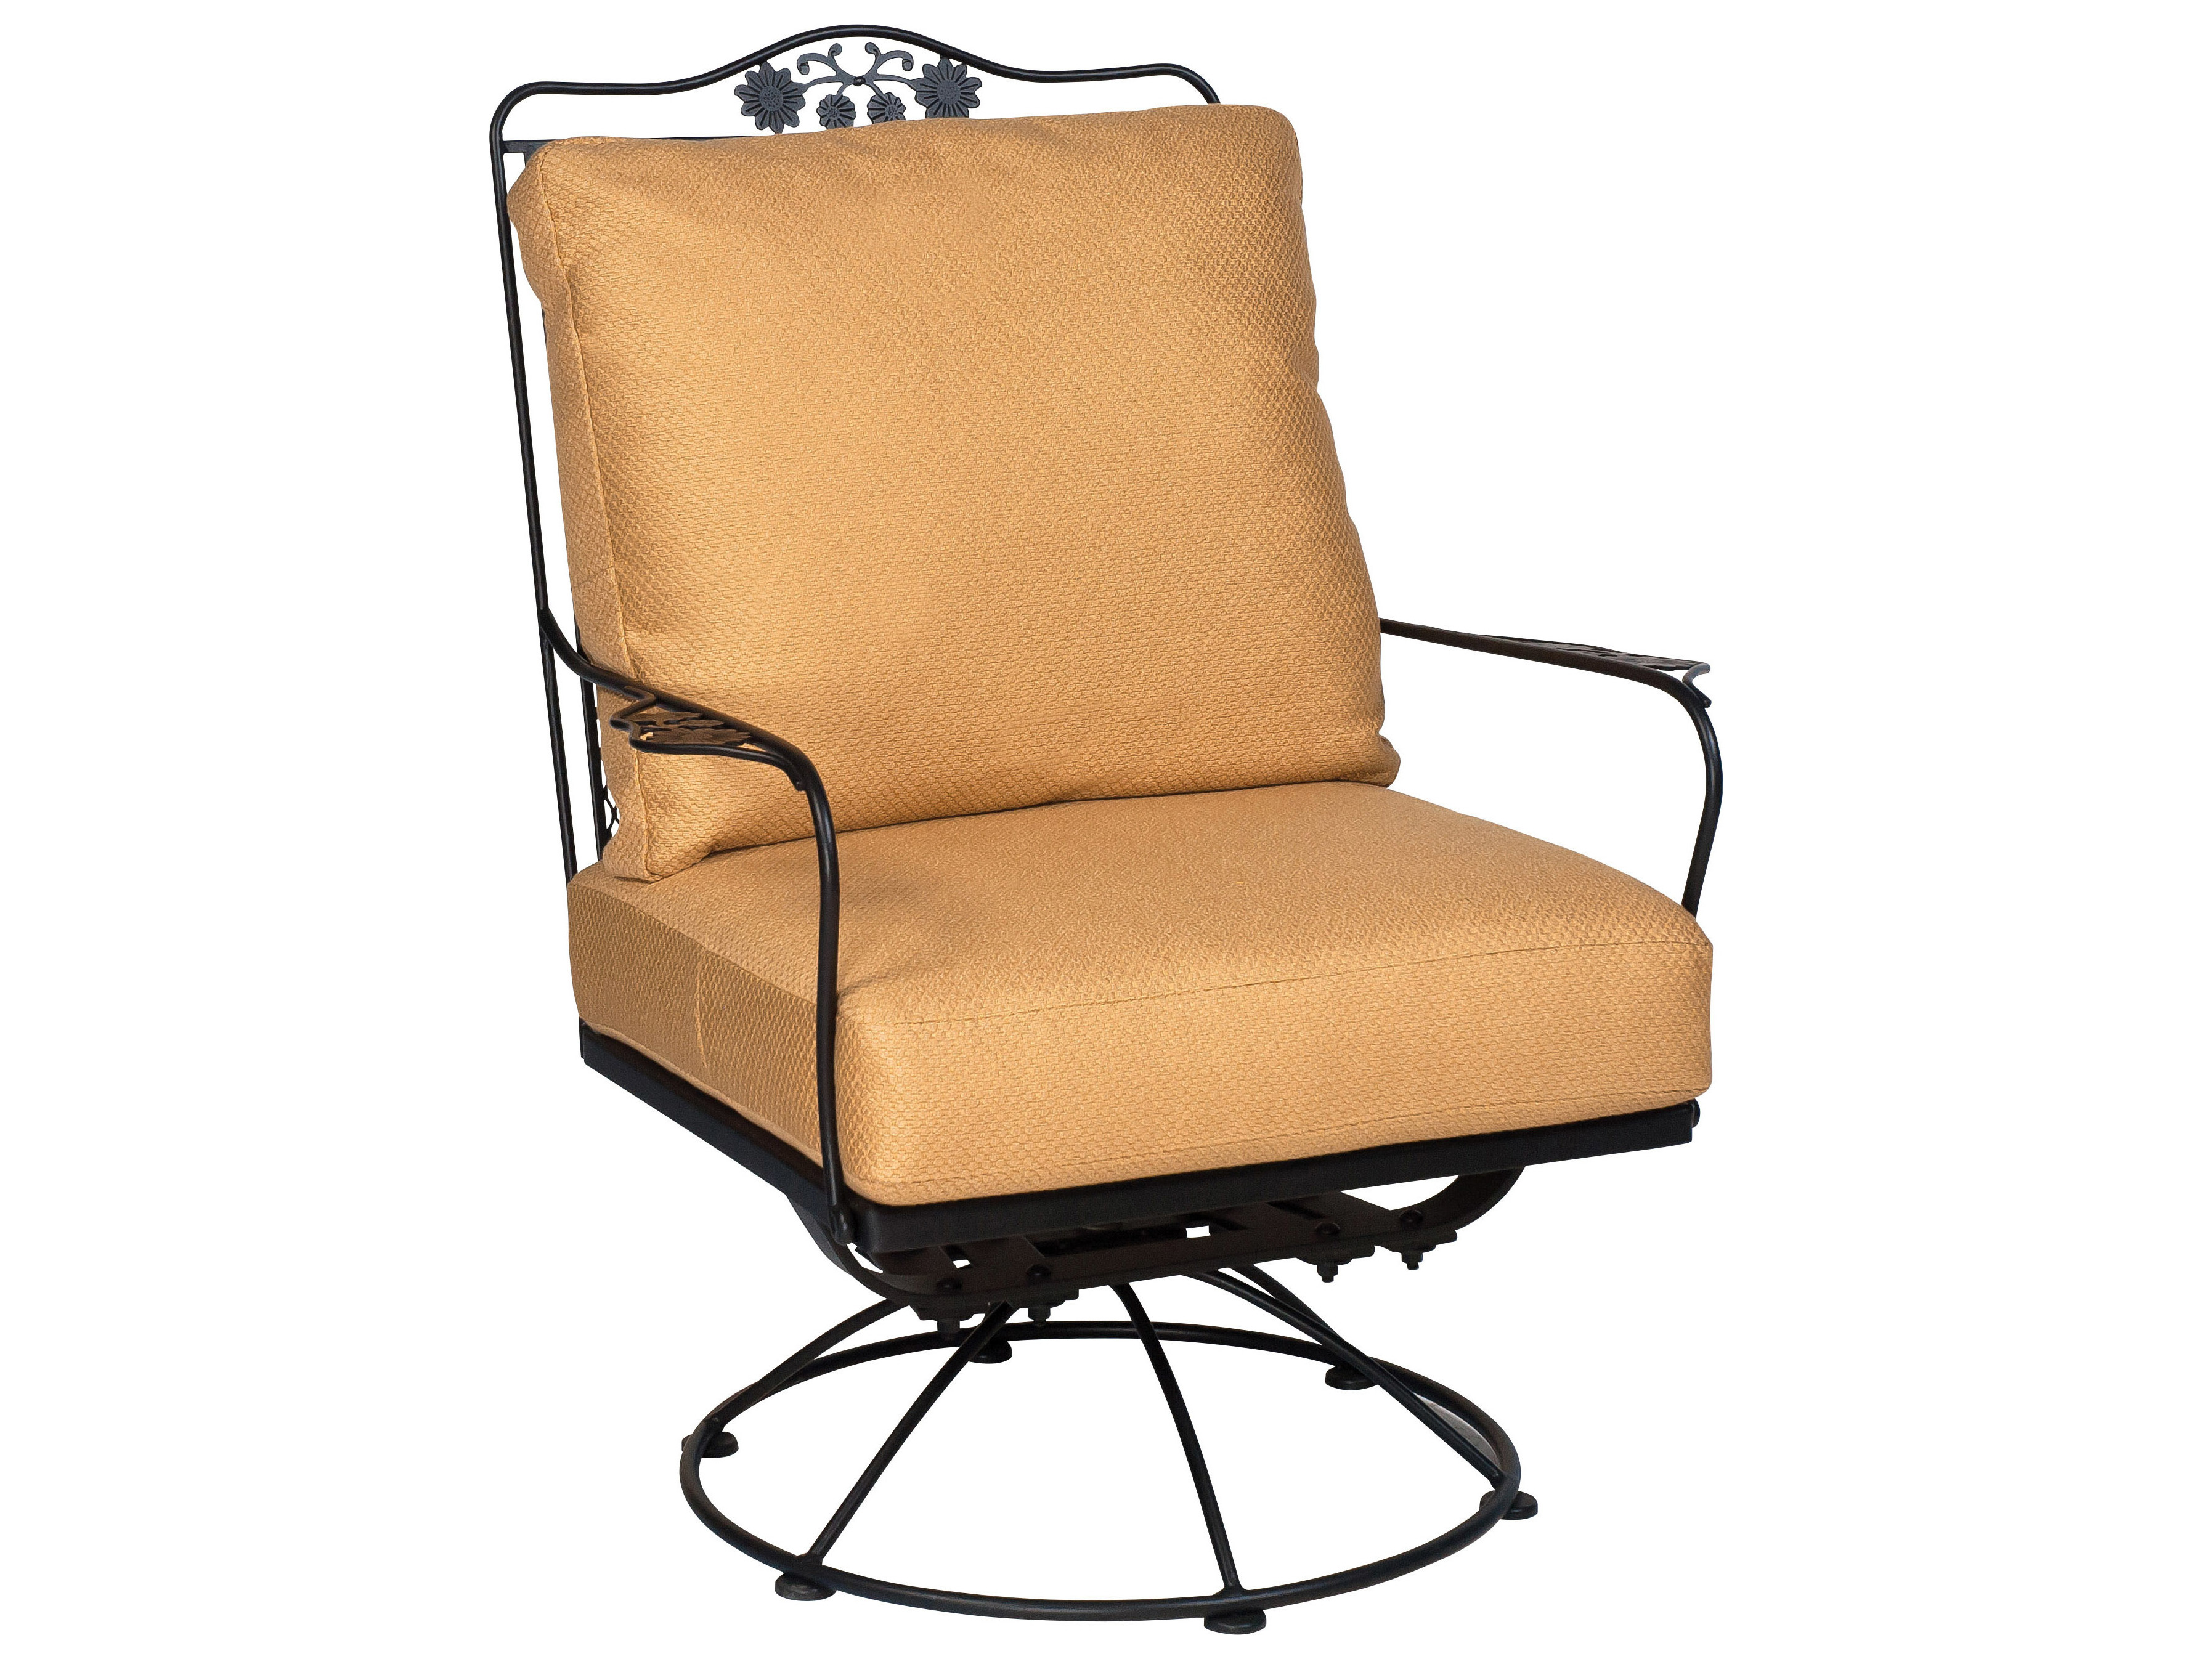 Woodard Briarwood Swivel Rocker Lounge Chair Replacement